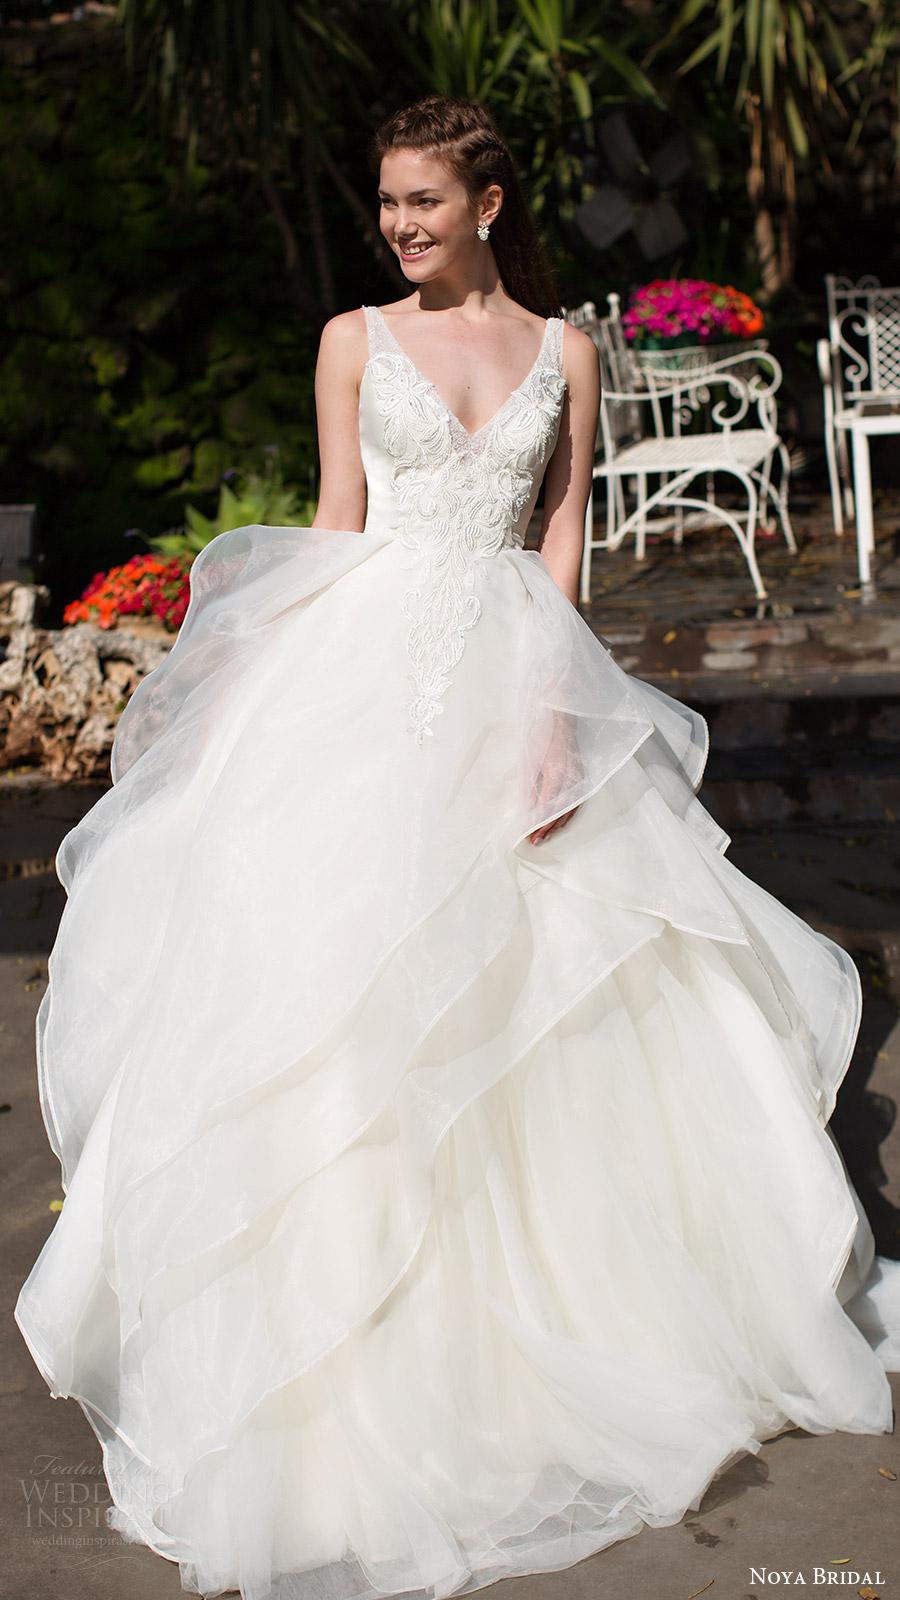 noya bridal 2016 sleeveless straps vneck aline ball gown wedding dress (1209) romantic princess mv